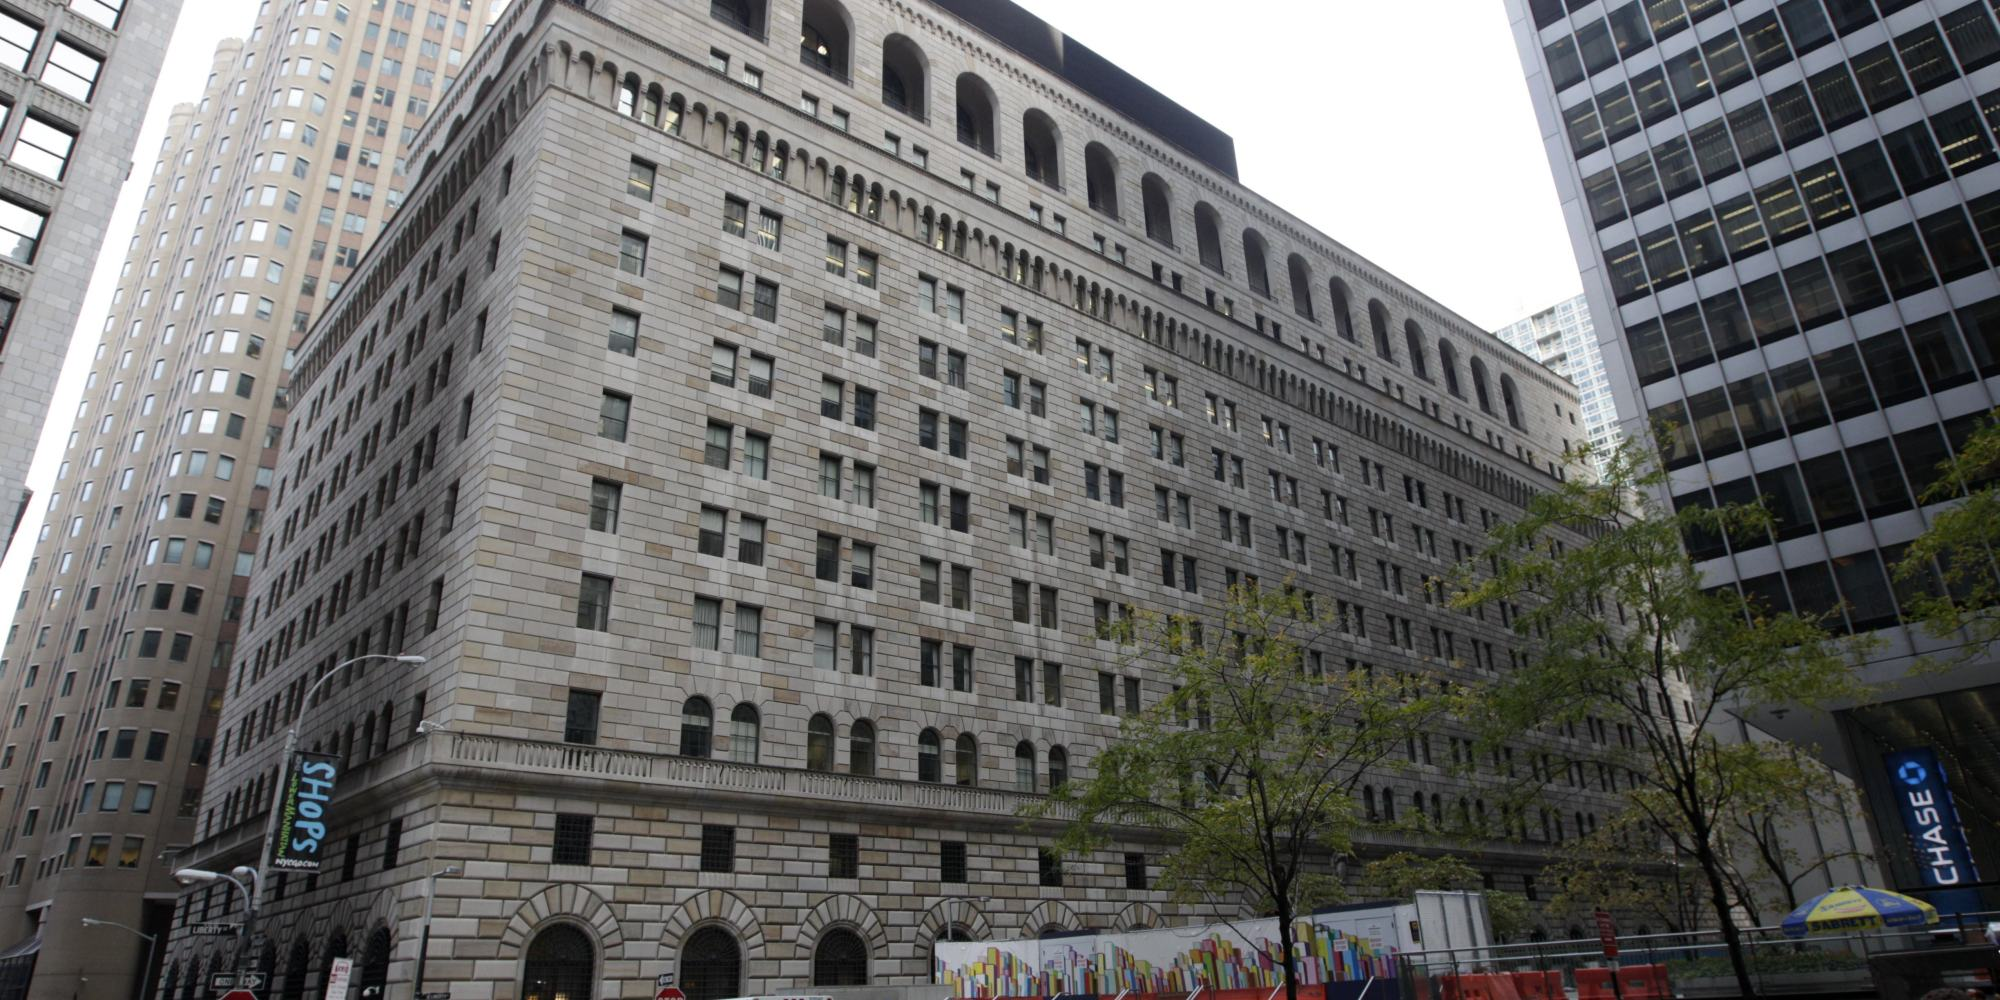 secret tapes suggest regulators at jpmorgan were blocked